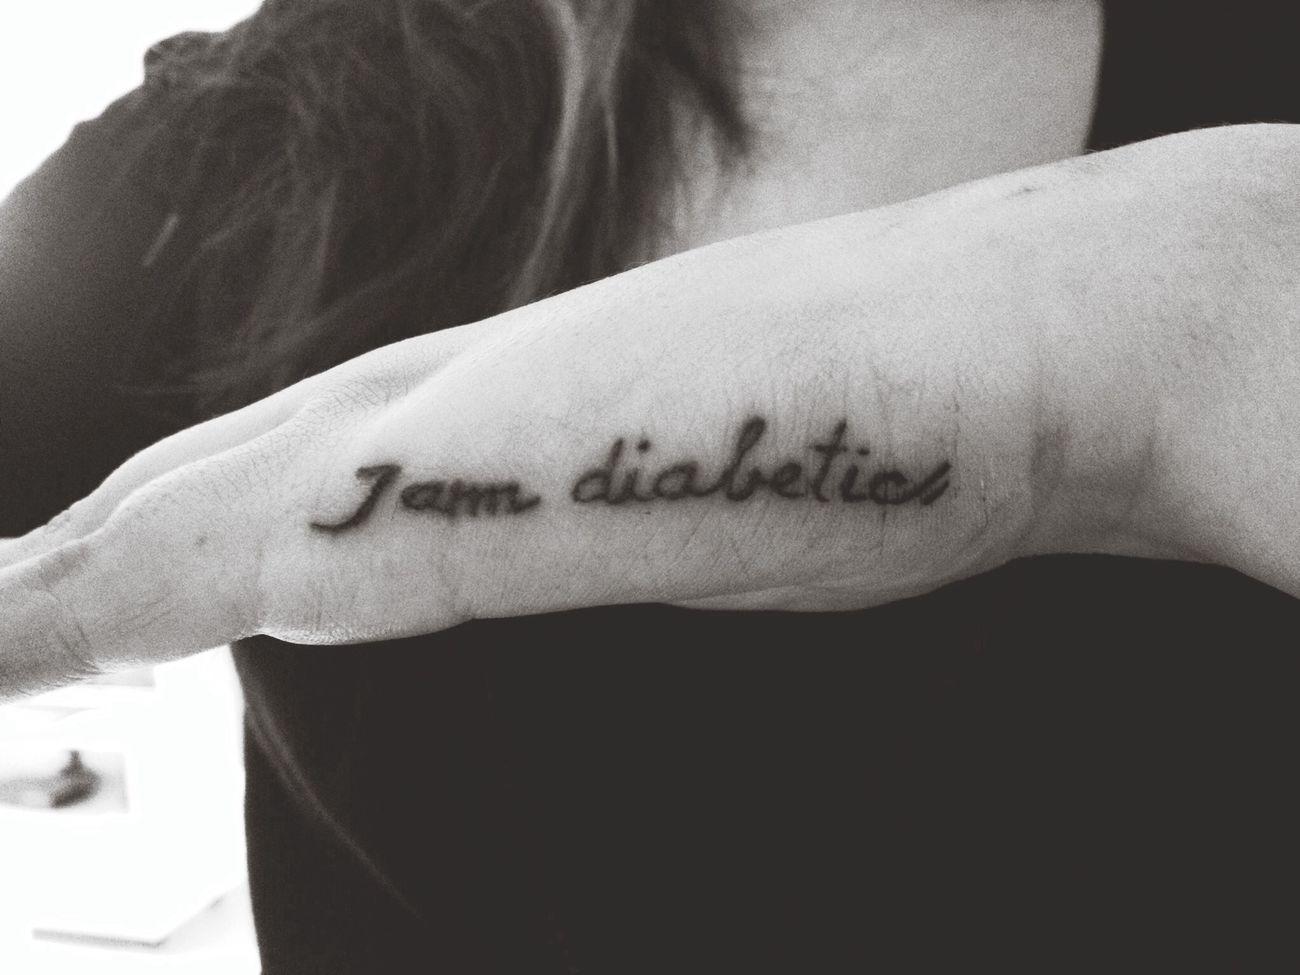 New Tattoo That's Me